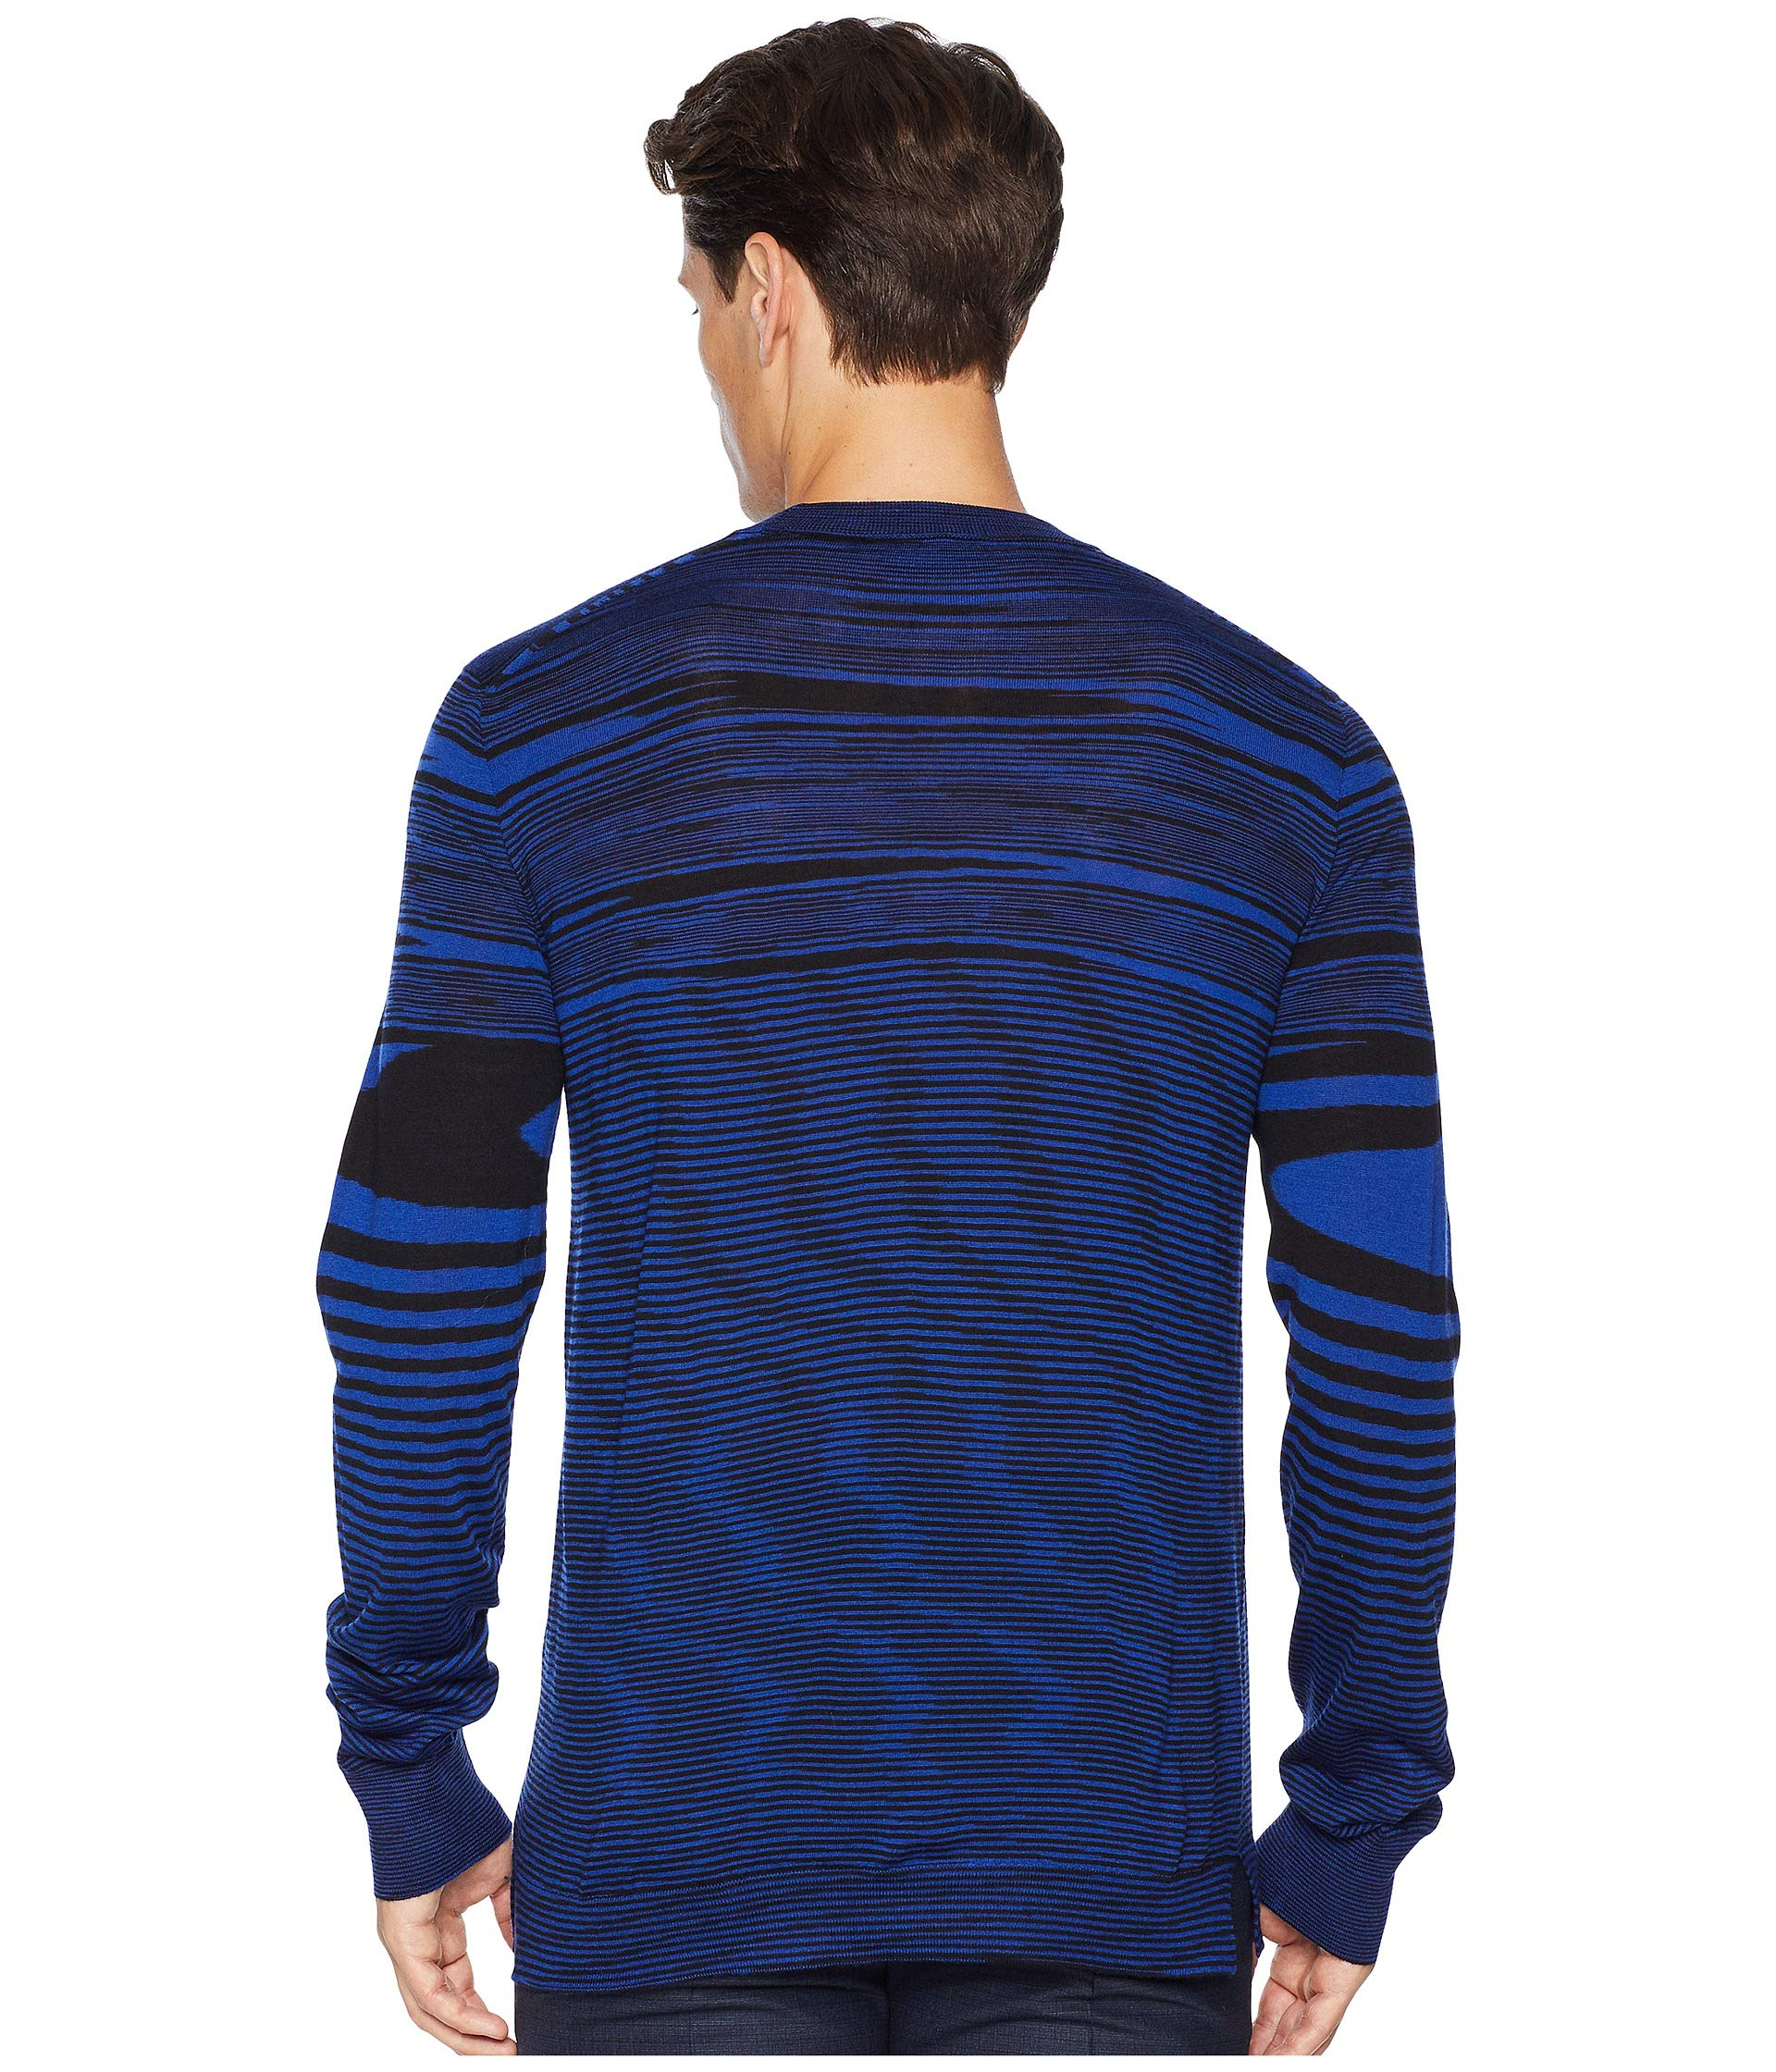 Blue Crew Neck Sweater Missoni Fiammato Club vUfw6qEXW